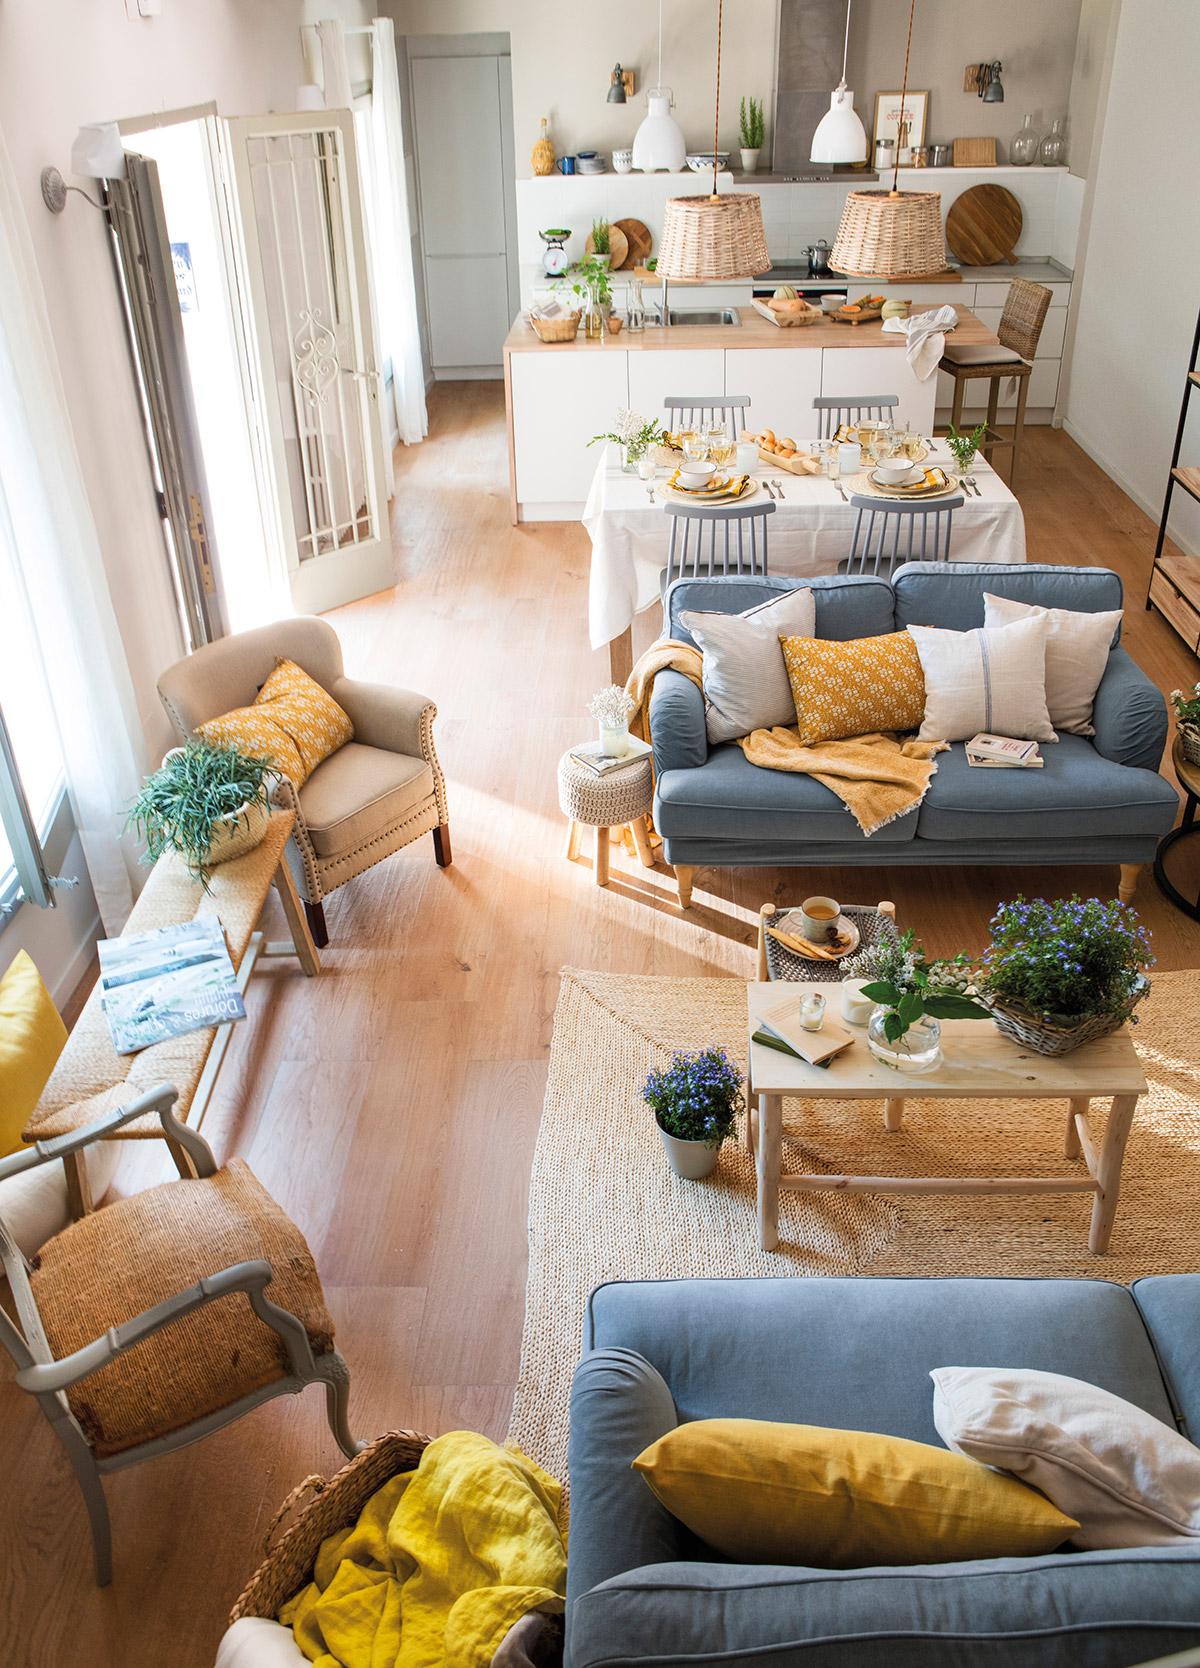 Ideas para aprovechar al m ximo el espacio de un piso peque o - Ideas para decorar un piso moderno ...